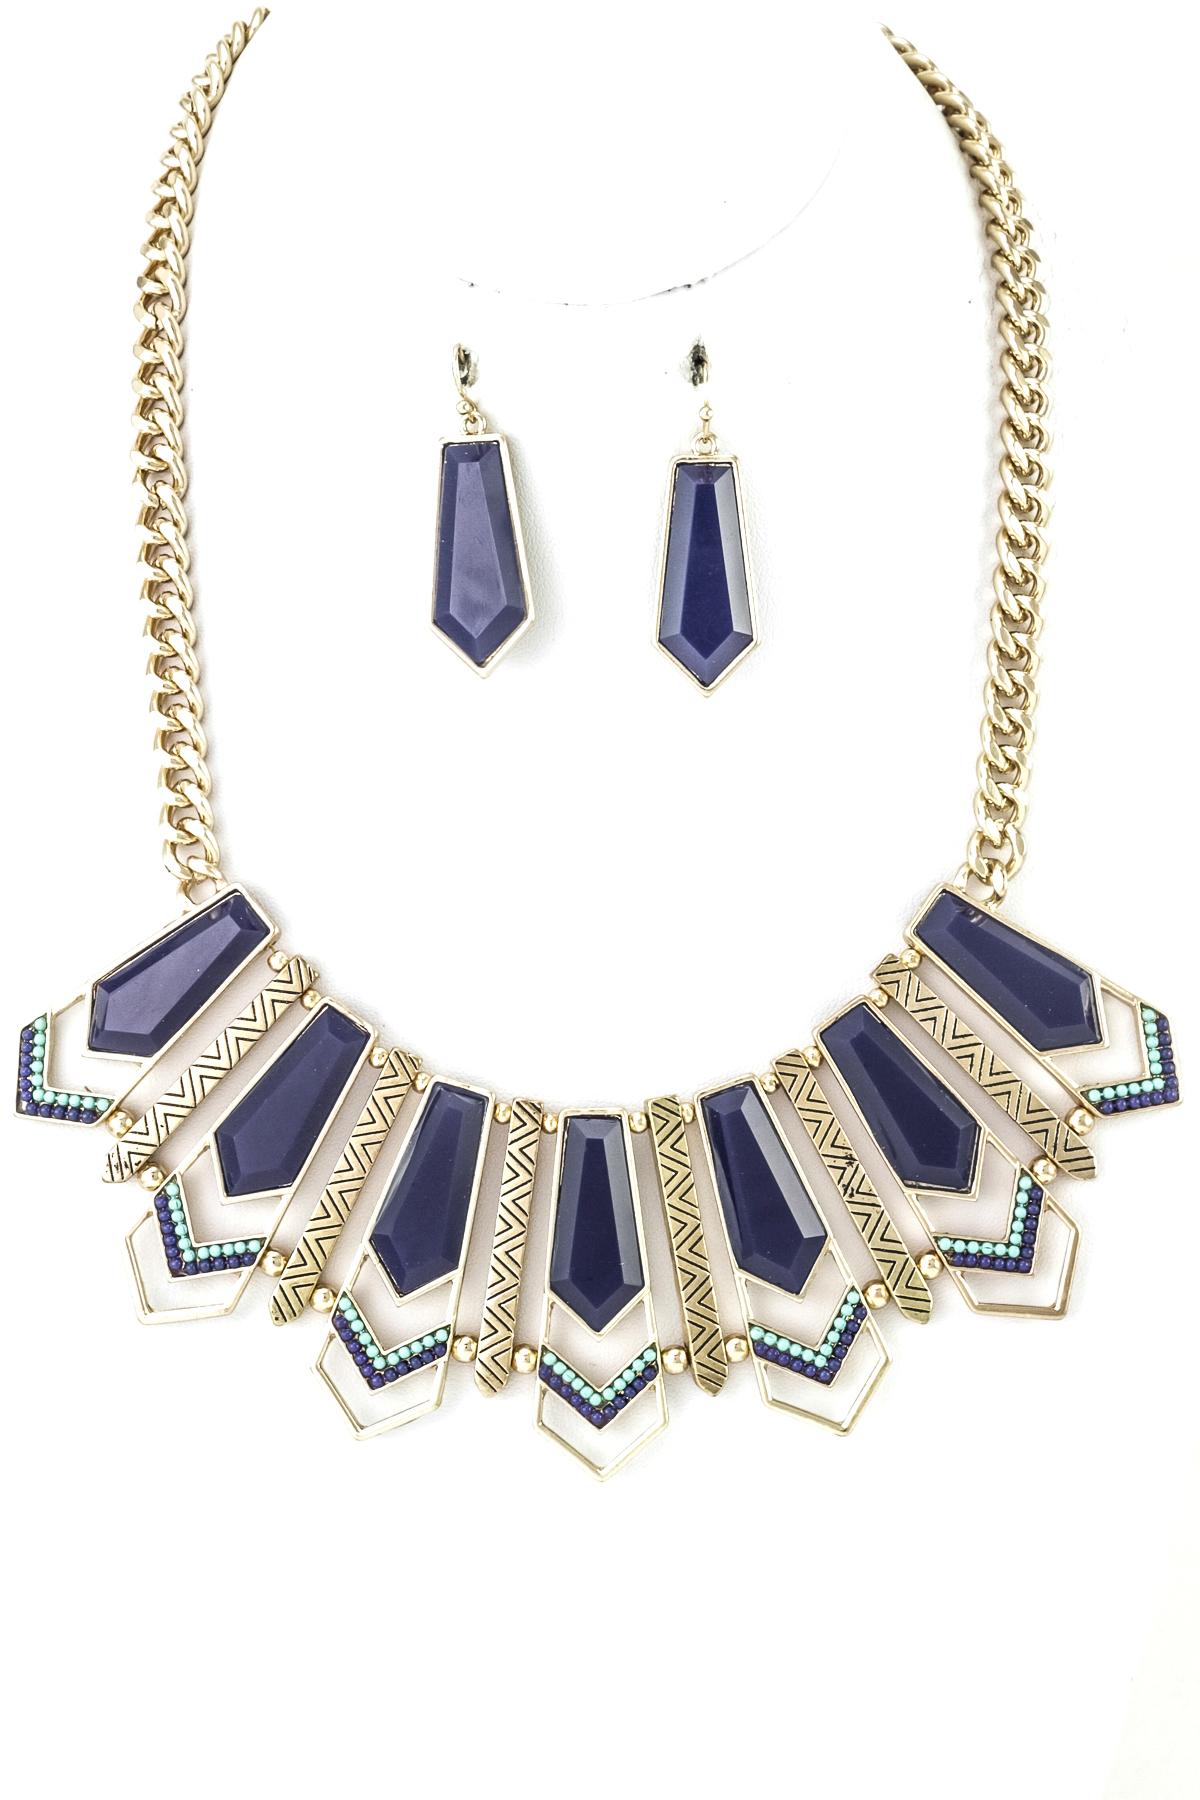 Angular Pentagon Necklace Set - Necklaces